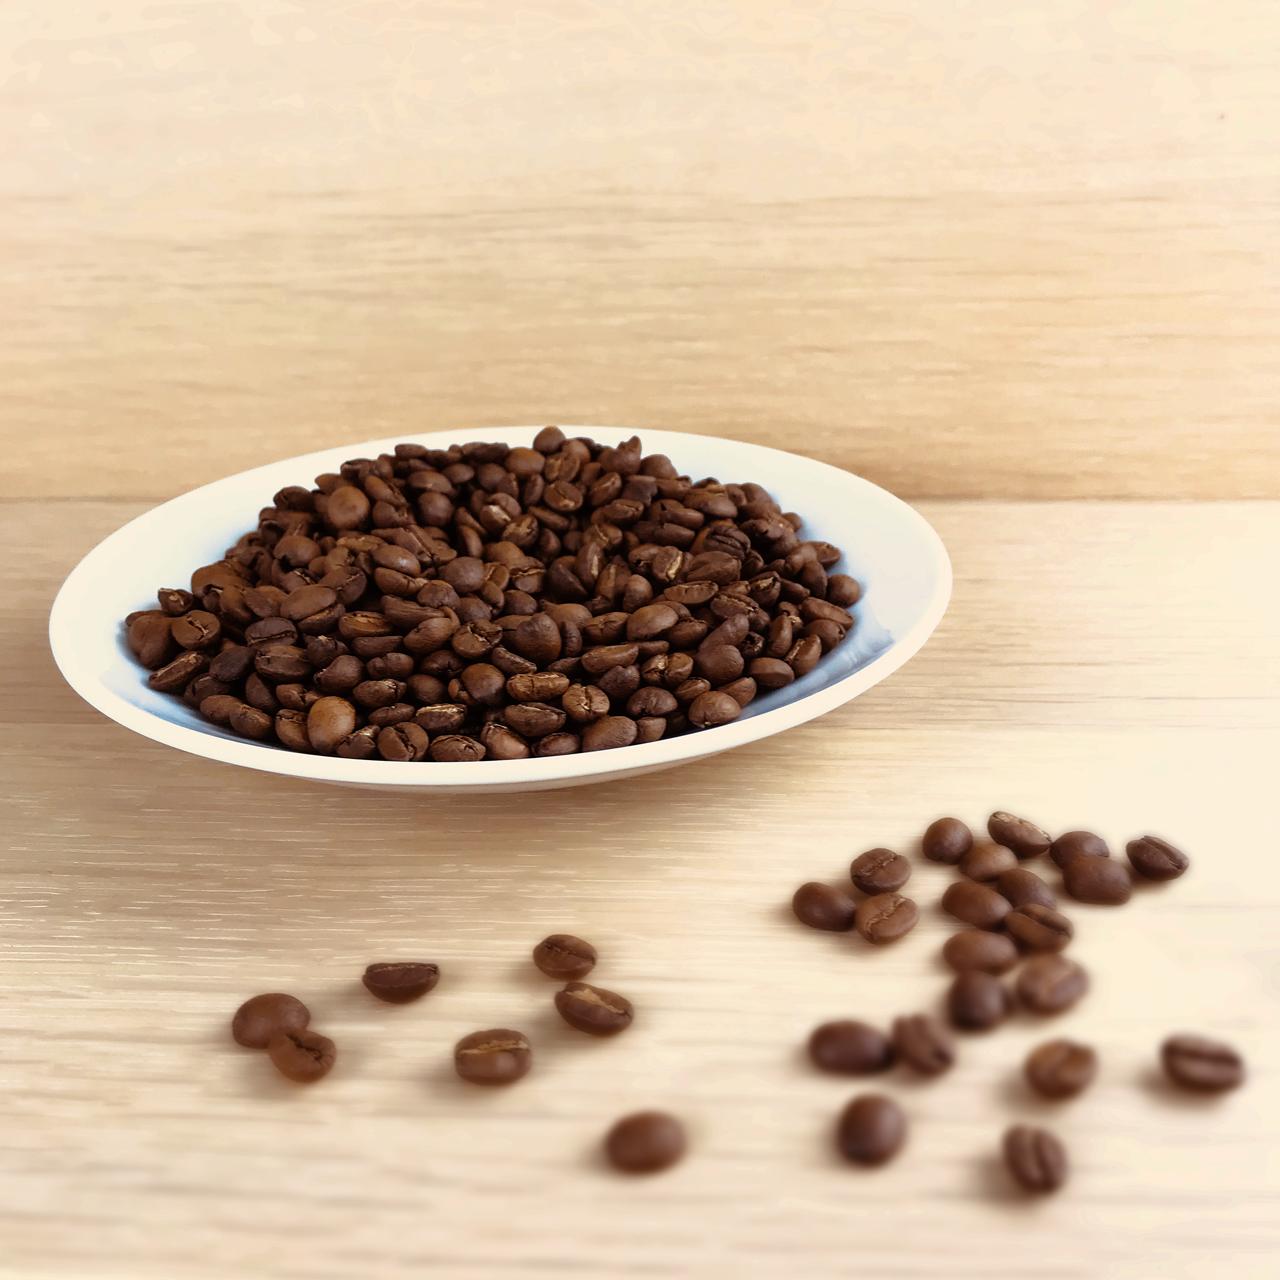 Himalayan スペシャルティコーヒー [焙煎豆・粉100g]